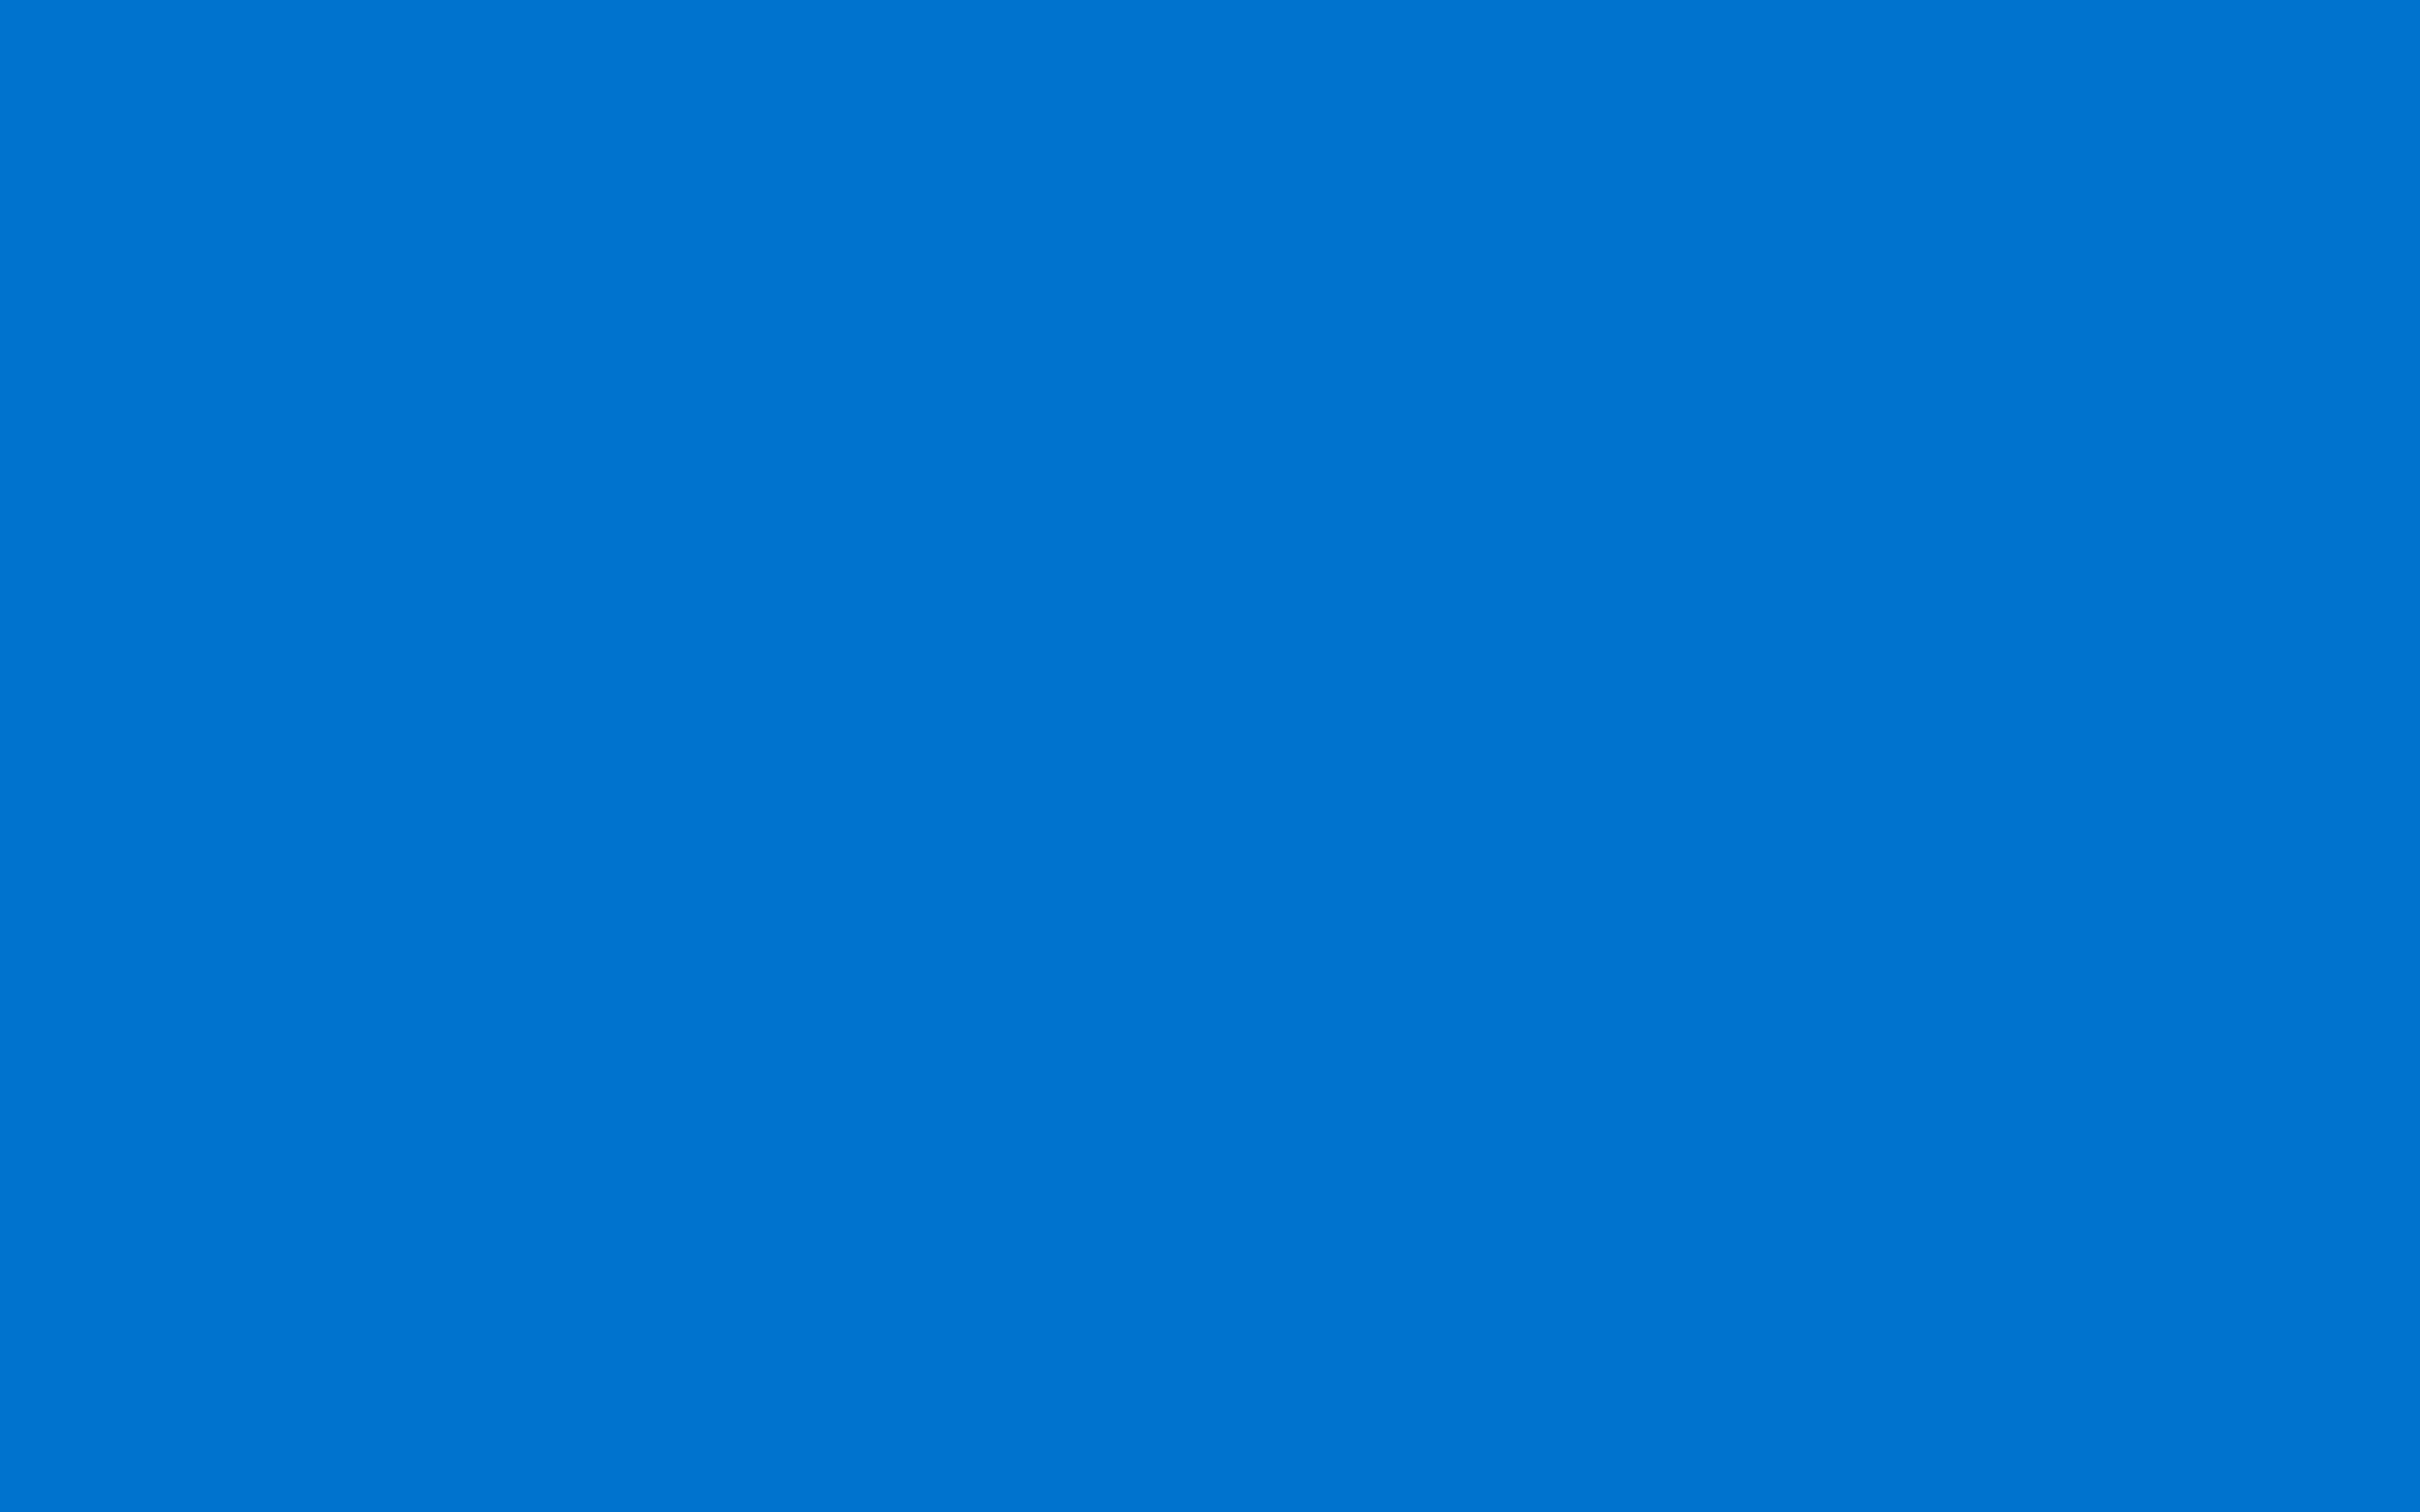 2560x1600 Blue Ridge Mountain Wallpaper Computer Backgrounds Picture 2560x1600